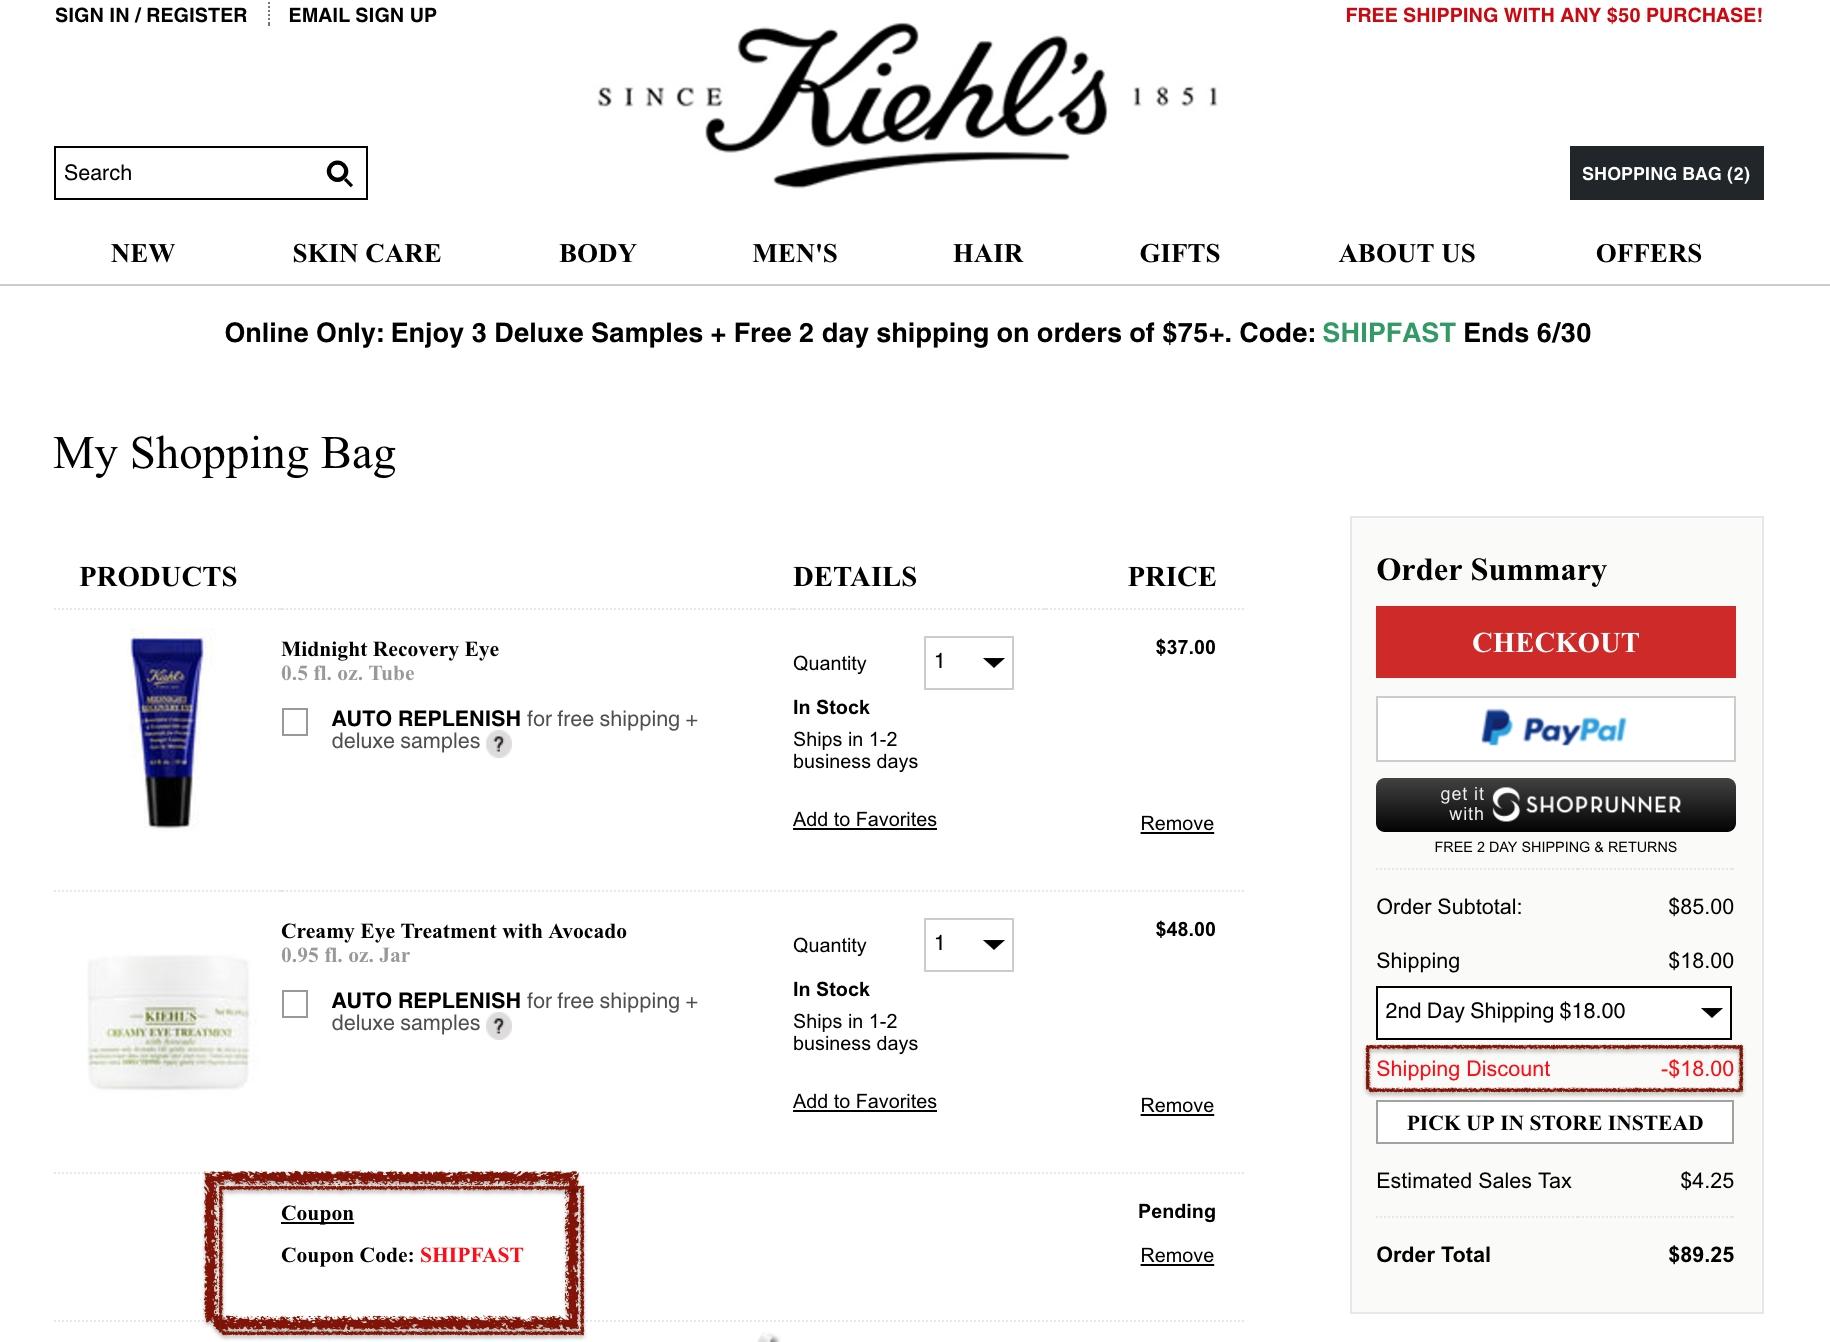 Kiehls coupon code